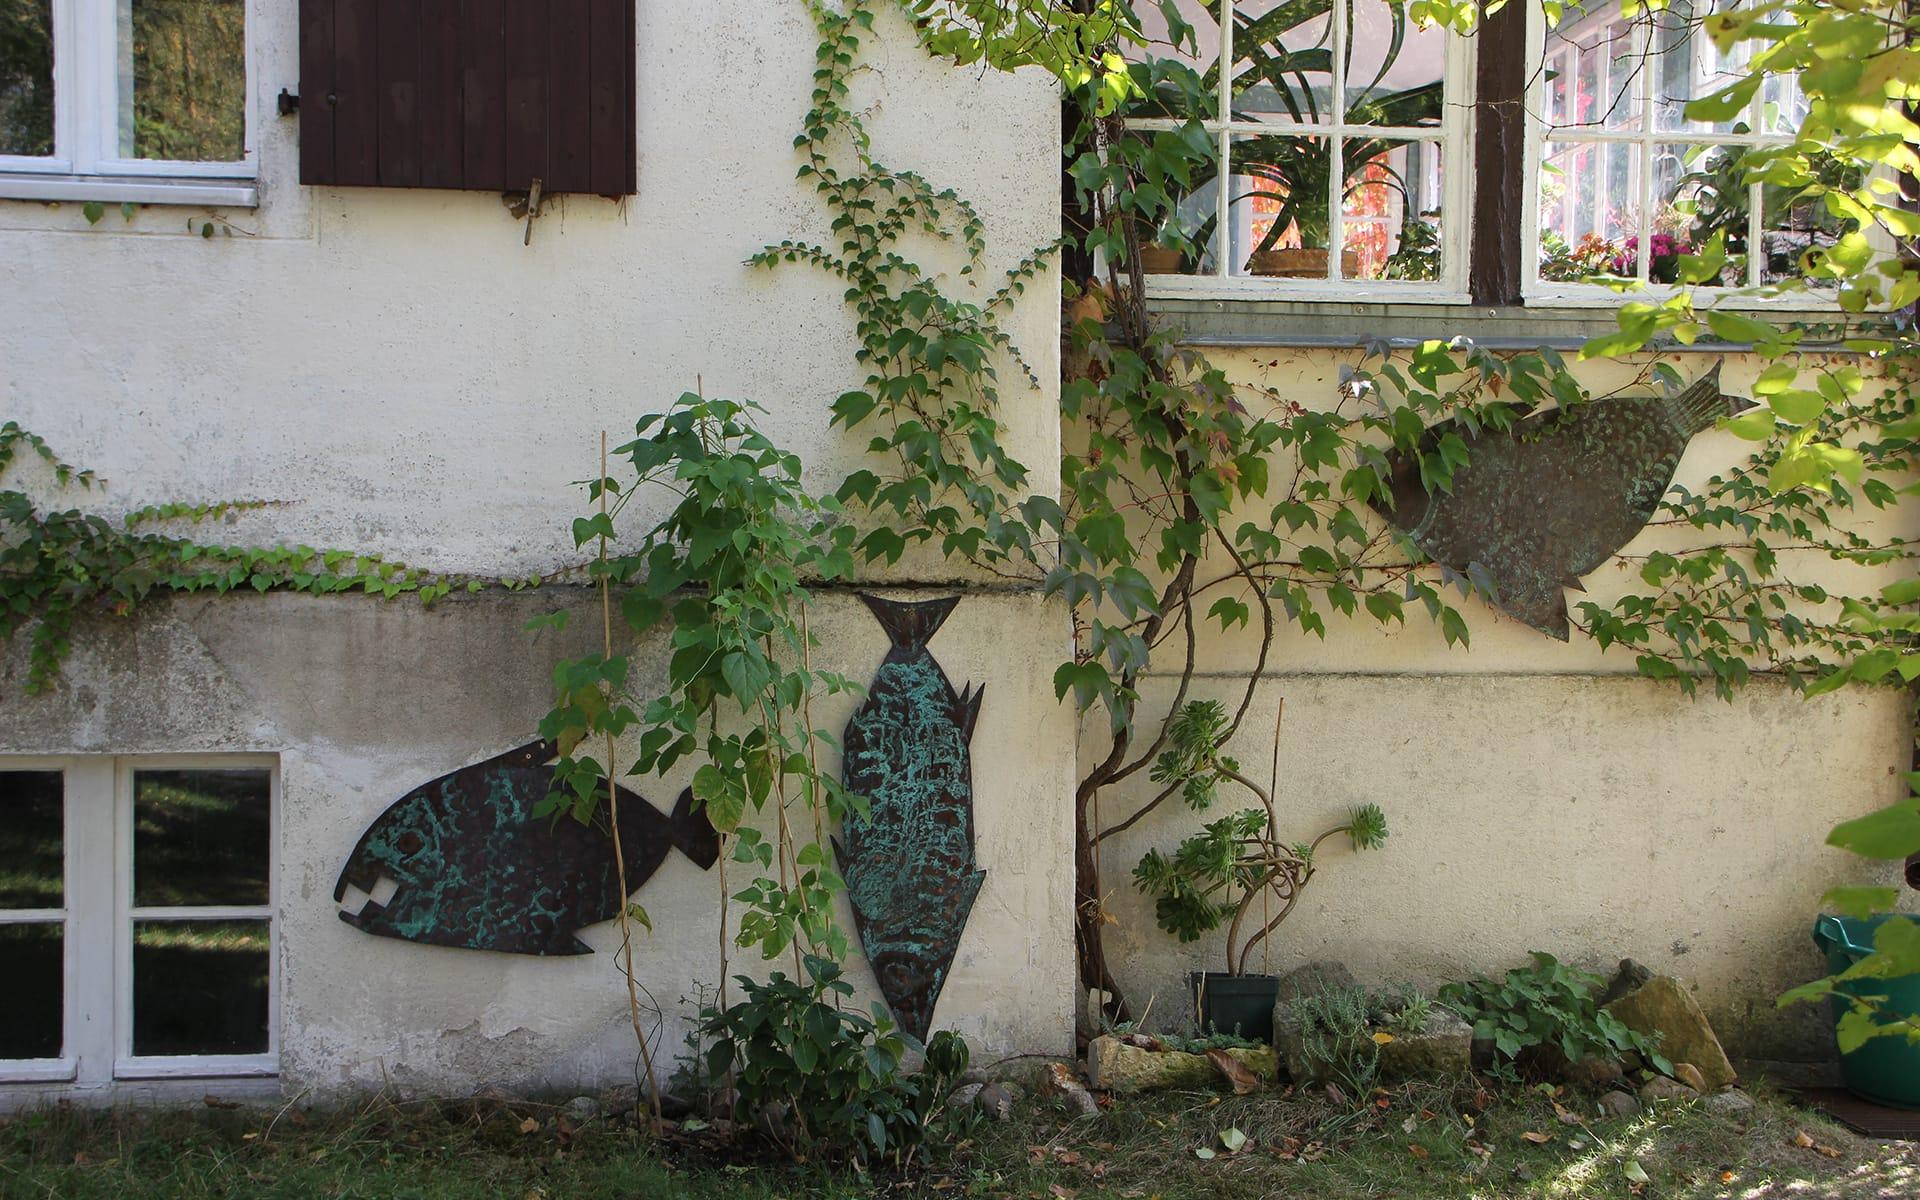 Kunsttour Stechlin - Fisch Skulpturen an der Wand im Künstlergarten